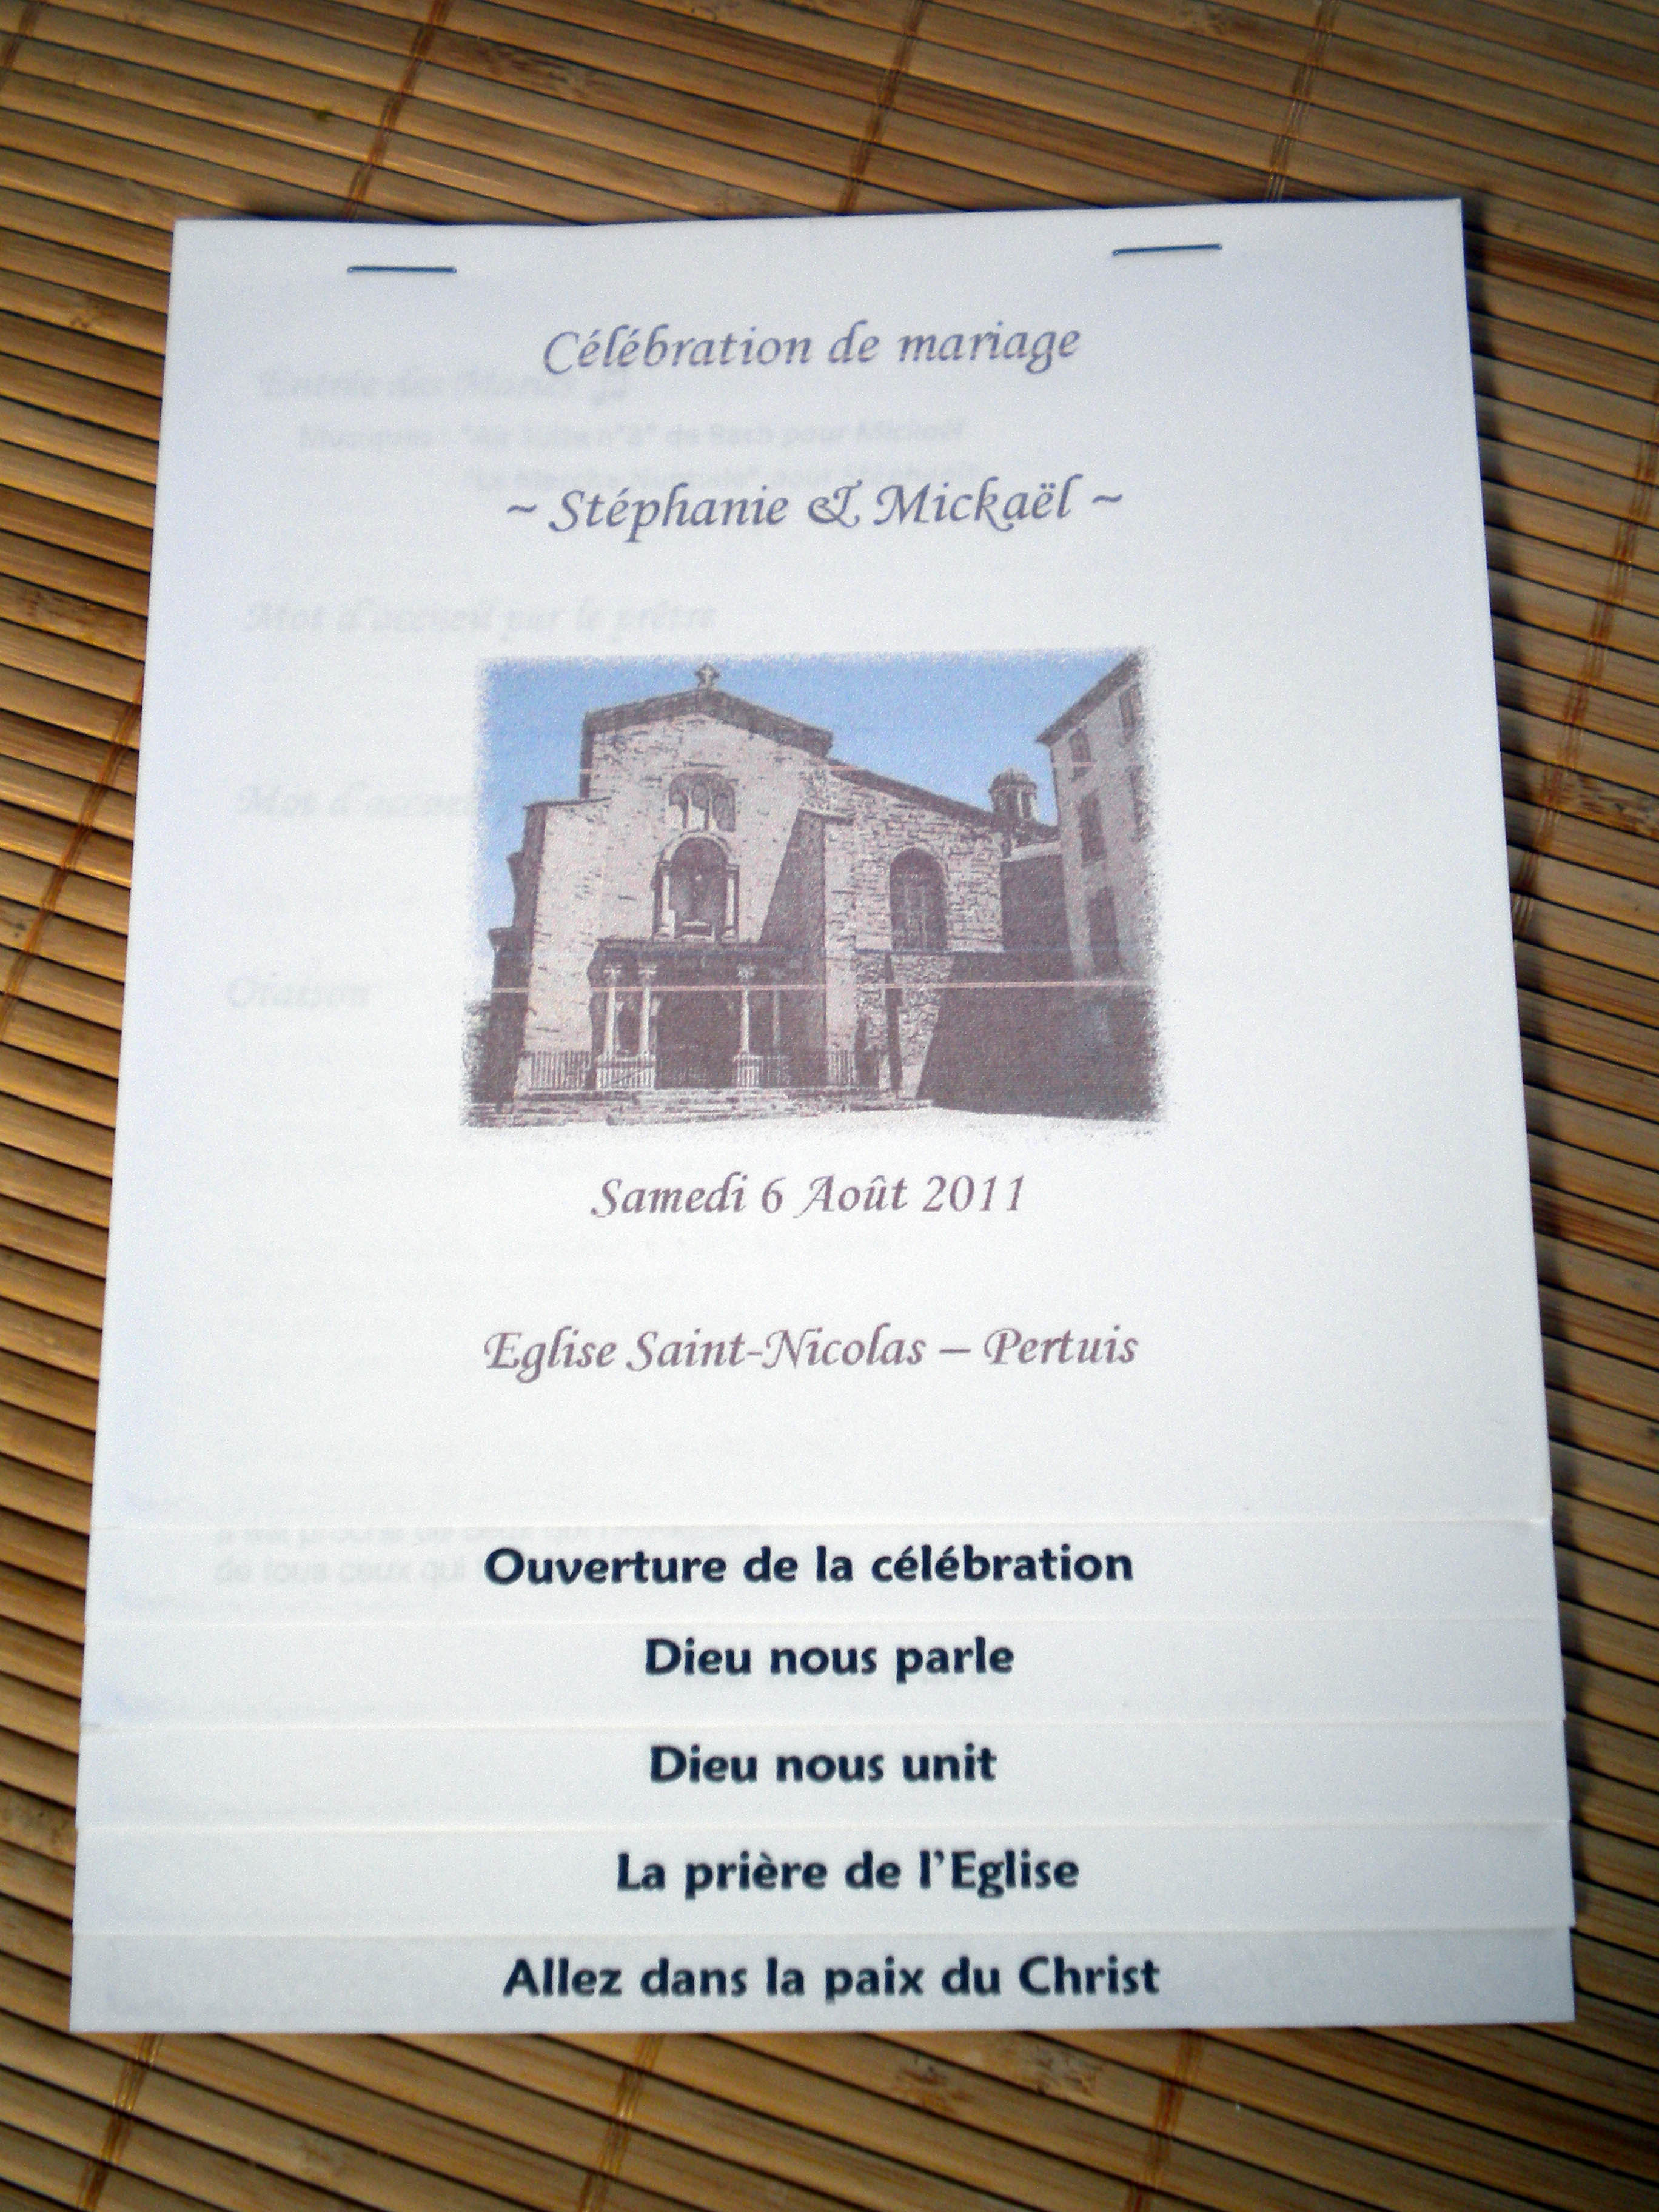 livret de messe essai - Exemple De Livret De Messe Mariage